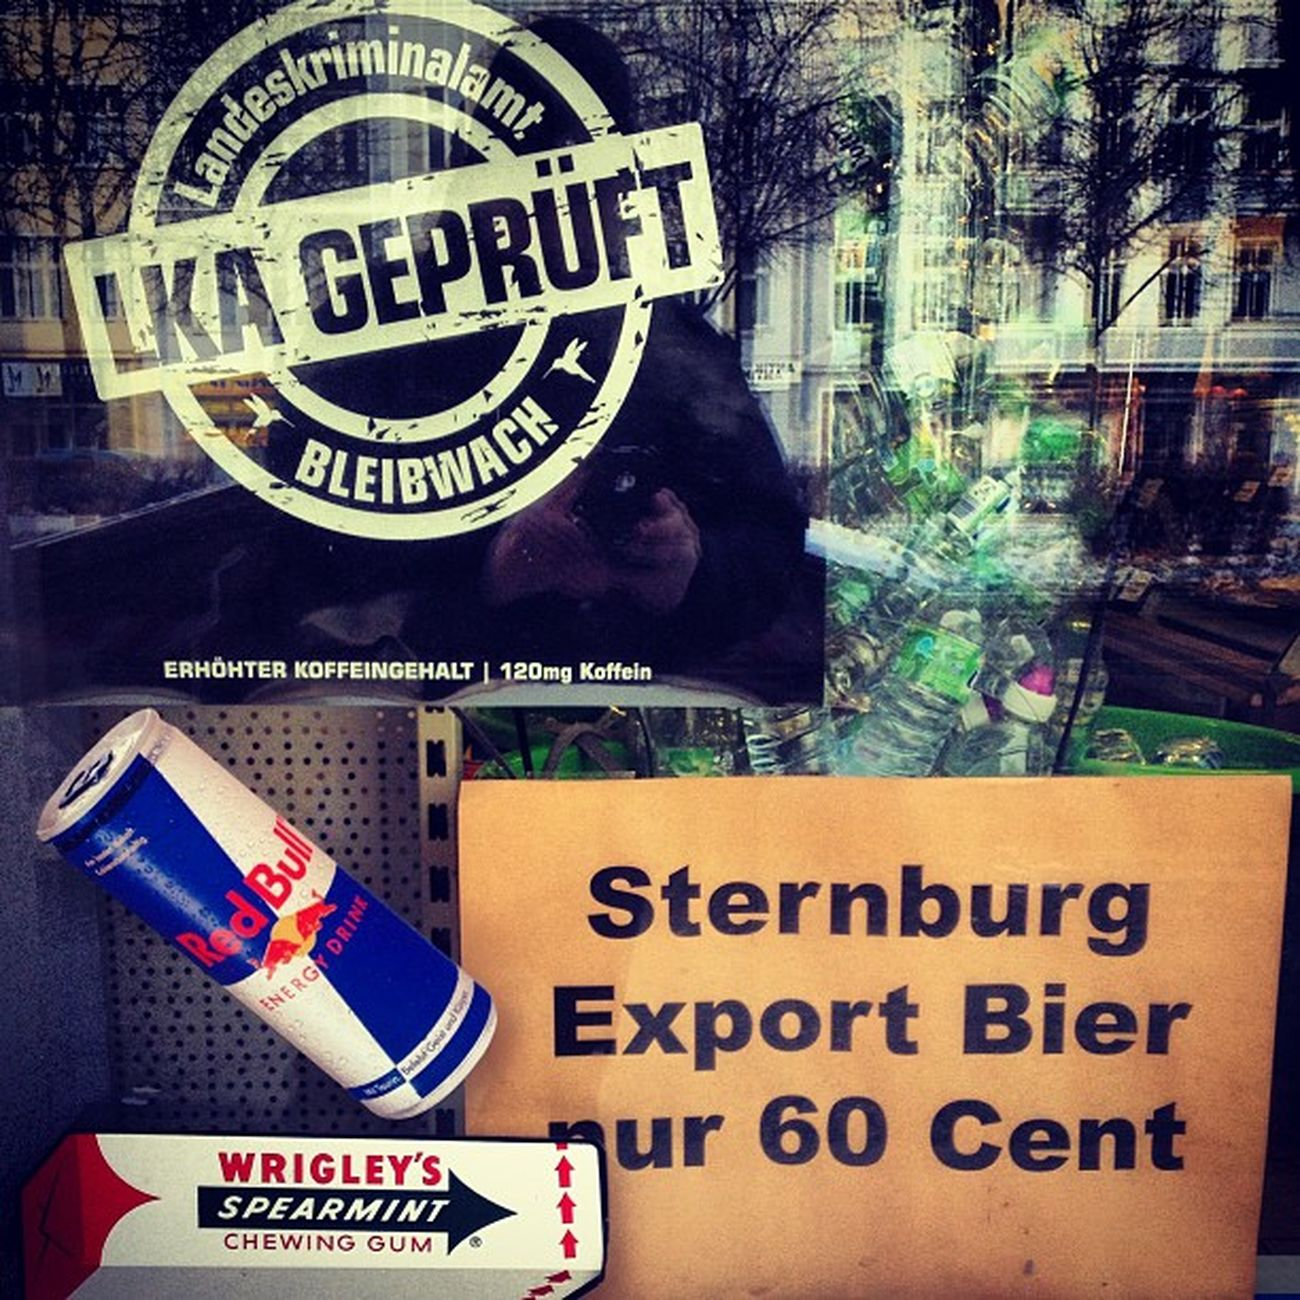 #igersberlin #instagood #tweegram #photooftheday #follow #instamod #igers #picoftheday #instragamhub #instadaily #insta_germany #bestoftheday #igdaily #websteagam #instragramers #ig_special #igersberlin #gf_germany #all_shots #berlin #germany #beer #shop Bestoftheday Igers IGDaily Tweegram Instagood Instadaily Igersberlin Insta_germany Beer Gf_germany Berlin Instragramers Germany Ig_special Shop Instragamhub Photooftheday Instamod Picoftheday Websteagam Follow All_shots